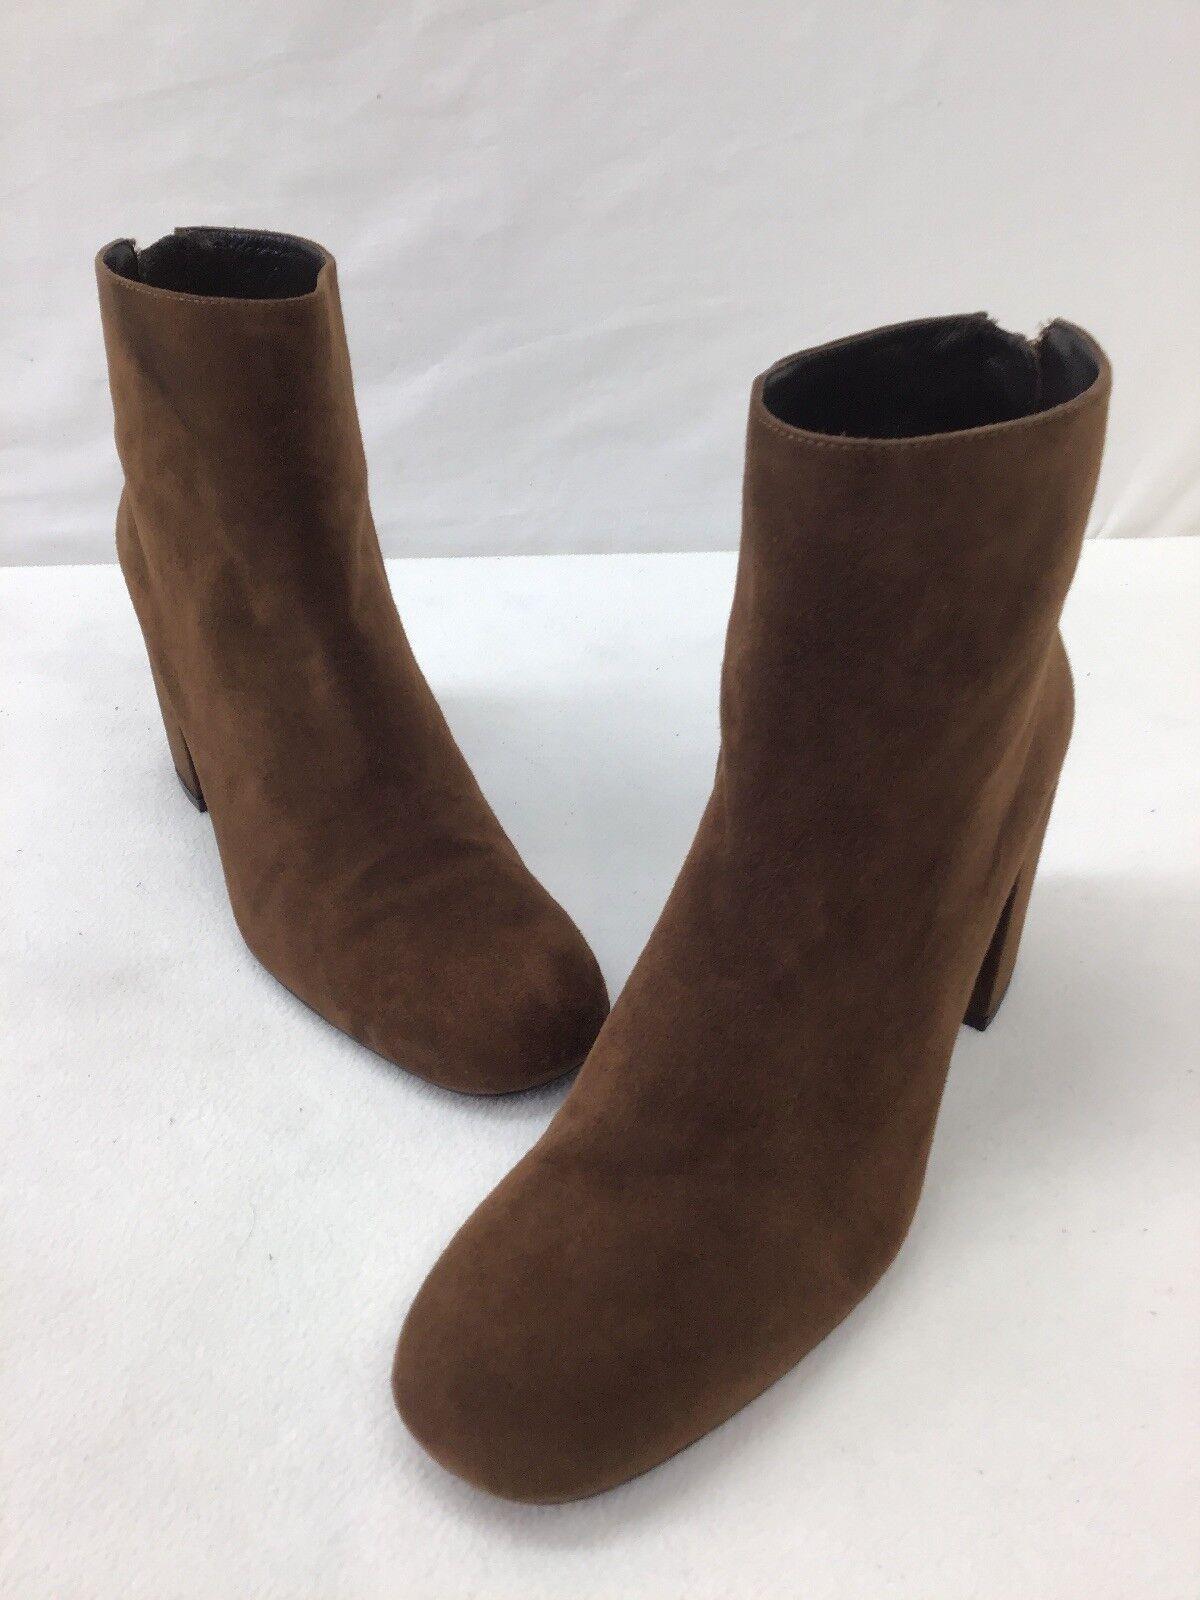 Stuart Weitzman Bacari Walnut Suede Heeled Booties Size 10.5M  H178